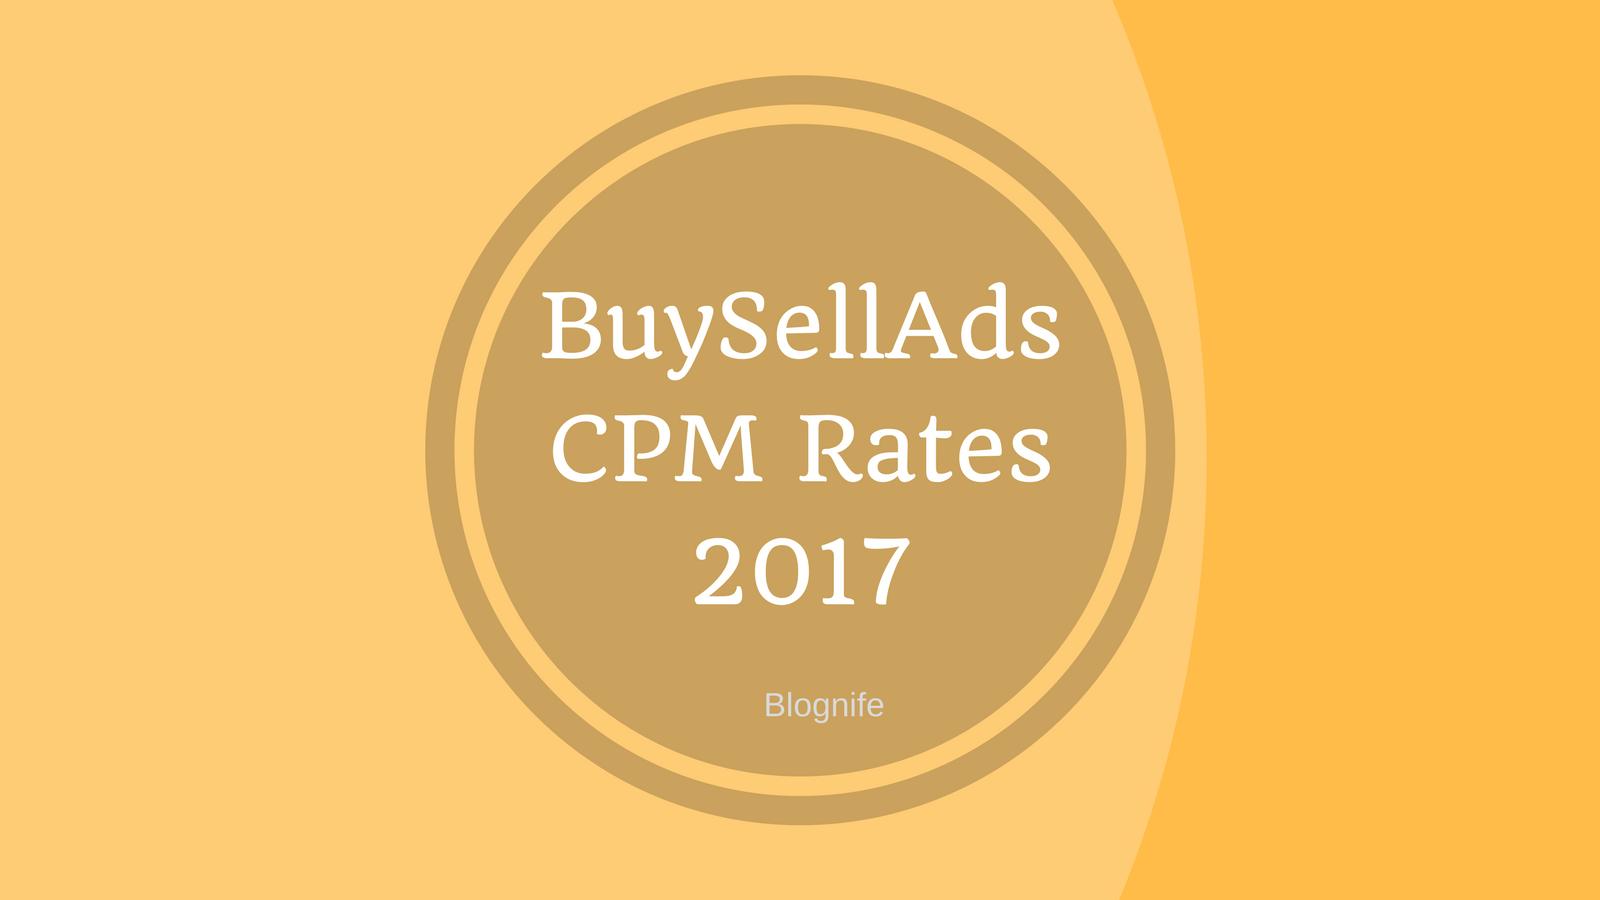 BuySellAds CPM Rates 2019